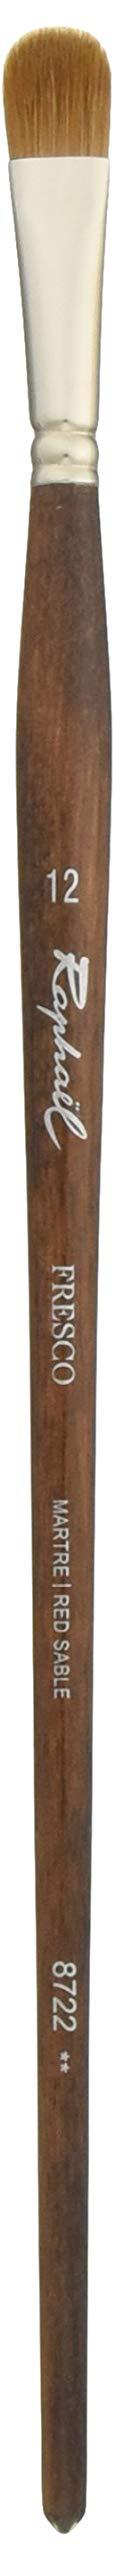 Raphael Fresco Red Sable, Oil Paint Brush, Series 8722, Filbert, Size 12